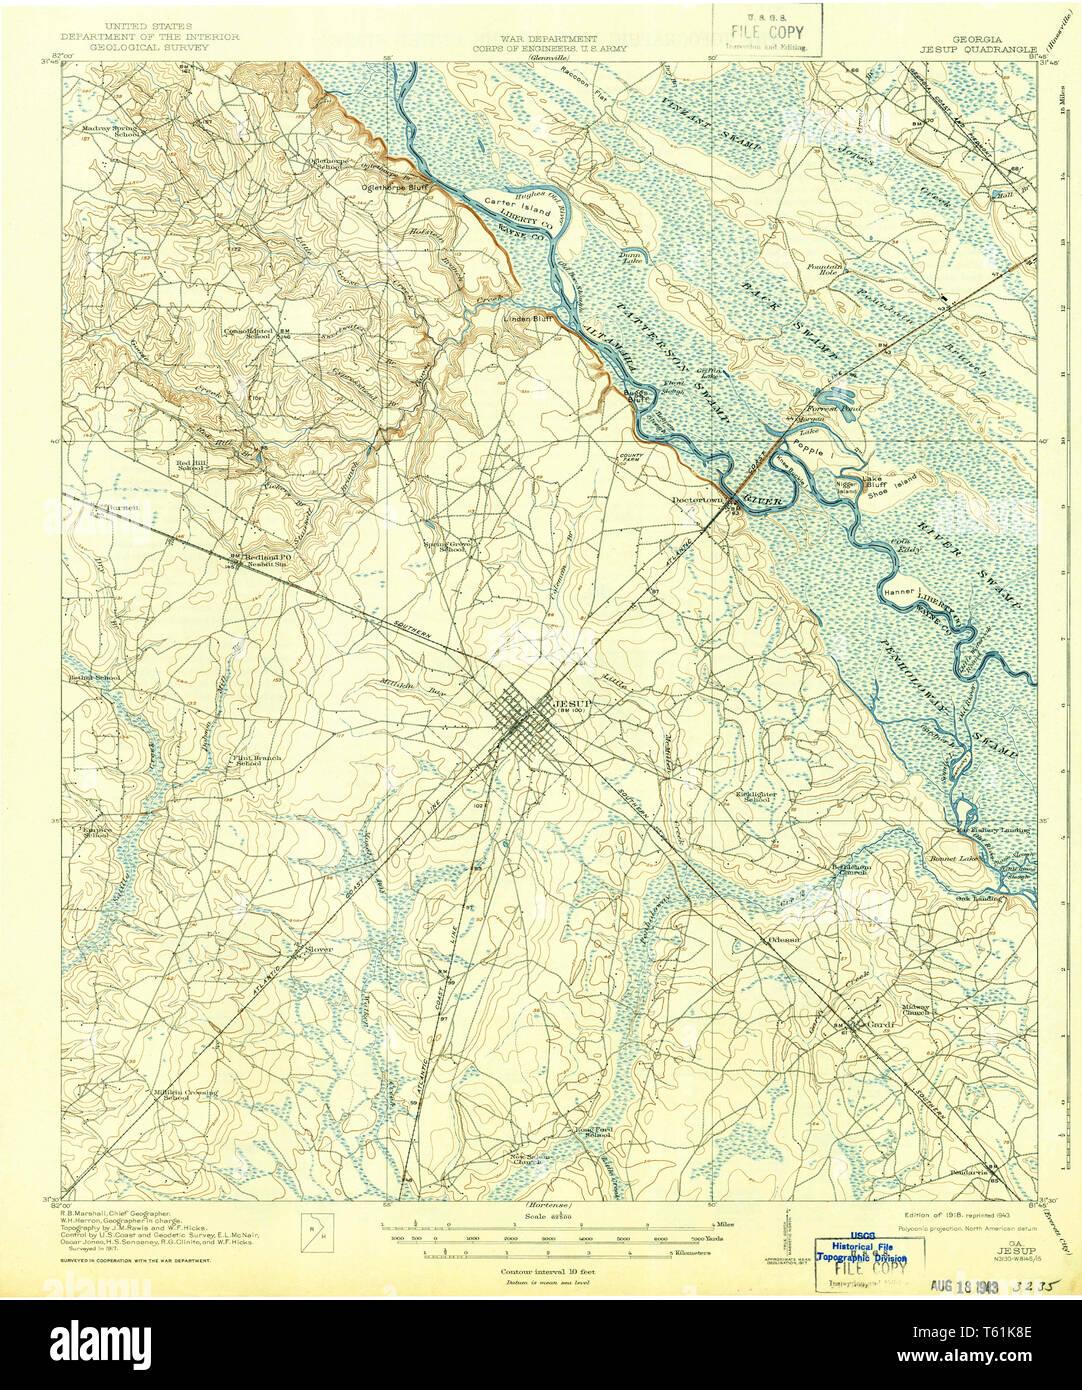 Map Of Jesup Georgia.Usgs Topo Map Georgia Ga Jesup 247492 1918 62500 Restoration Stock